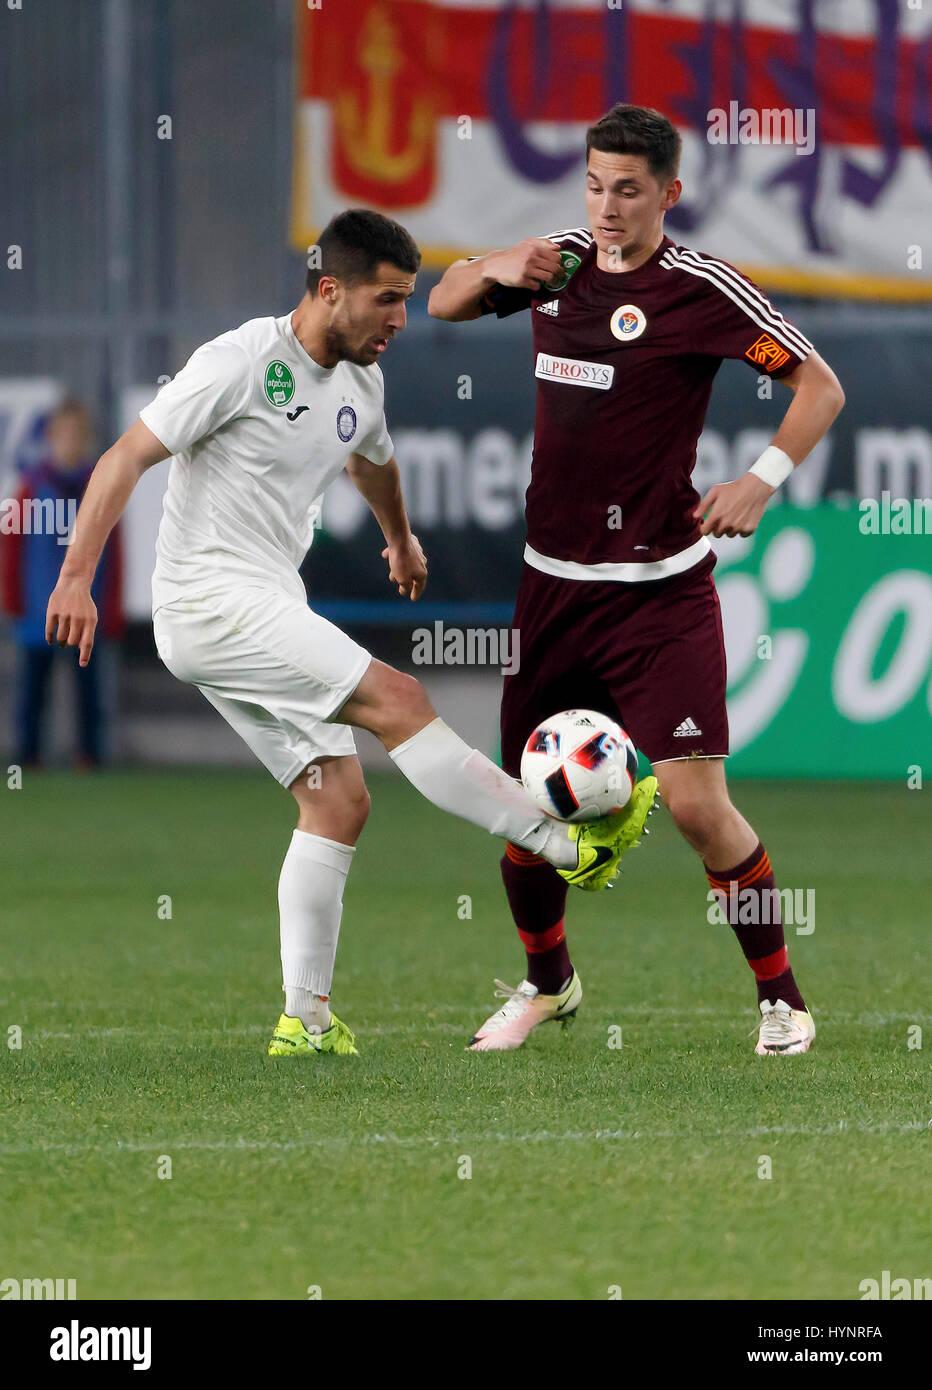 Budapest Hungary 05th Apr 2017 Mate Vida R of Vasas FC